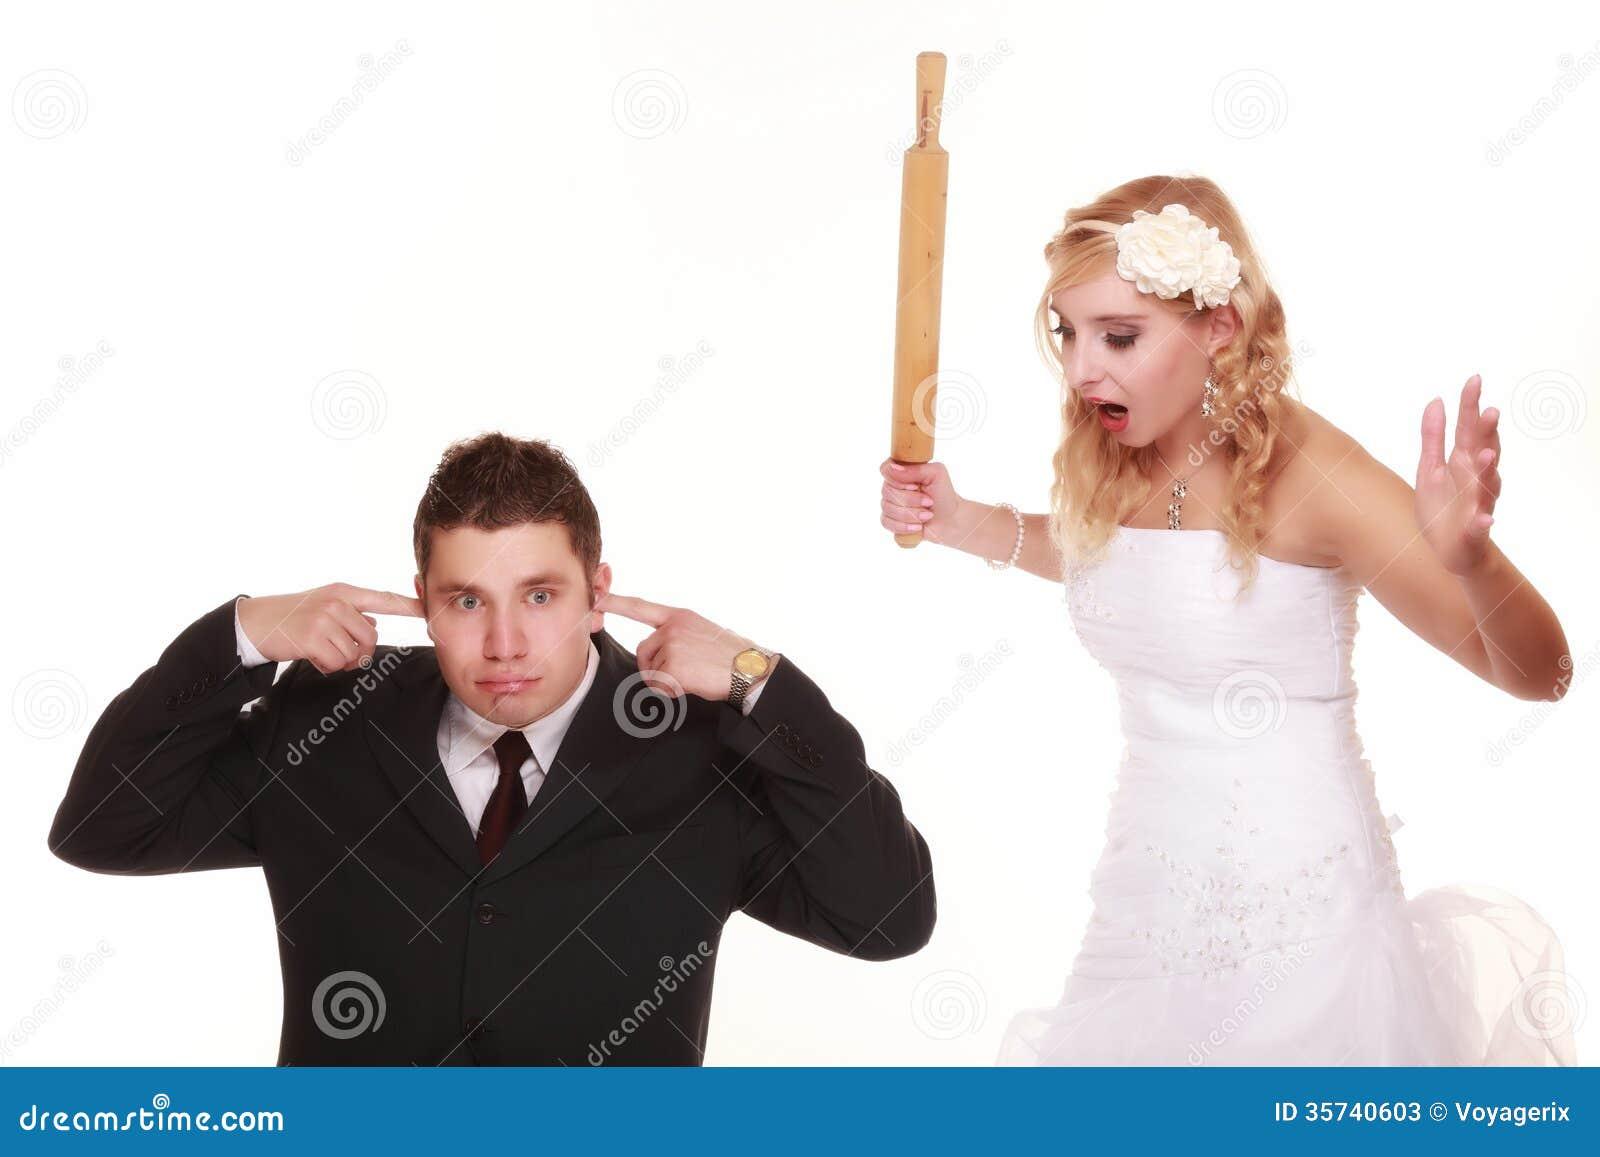 cute relationship arguments conflict